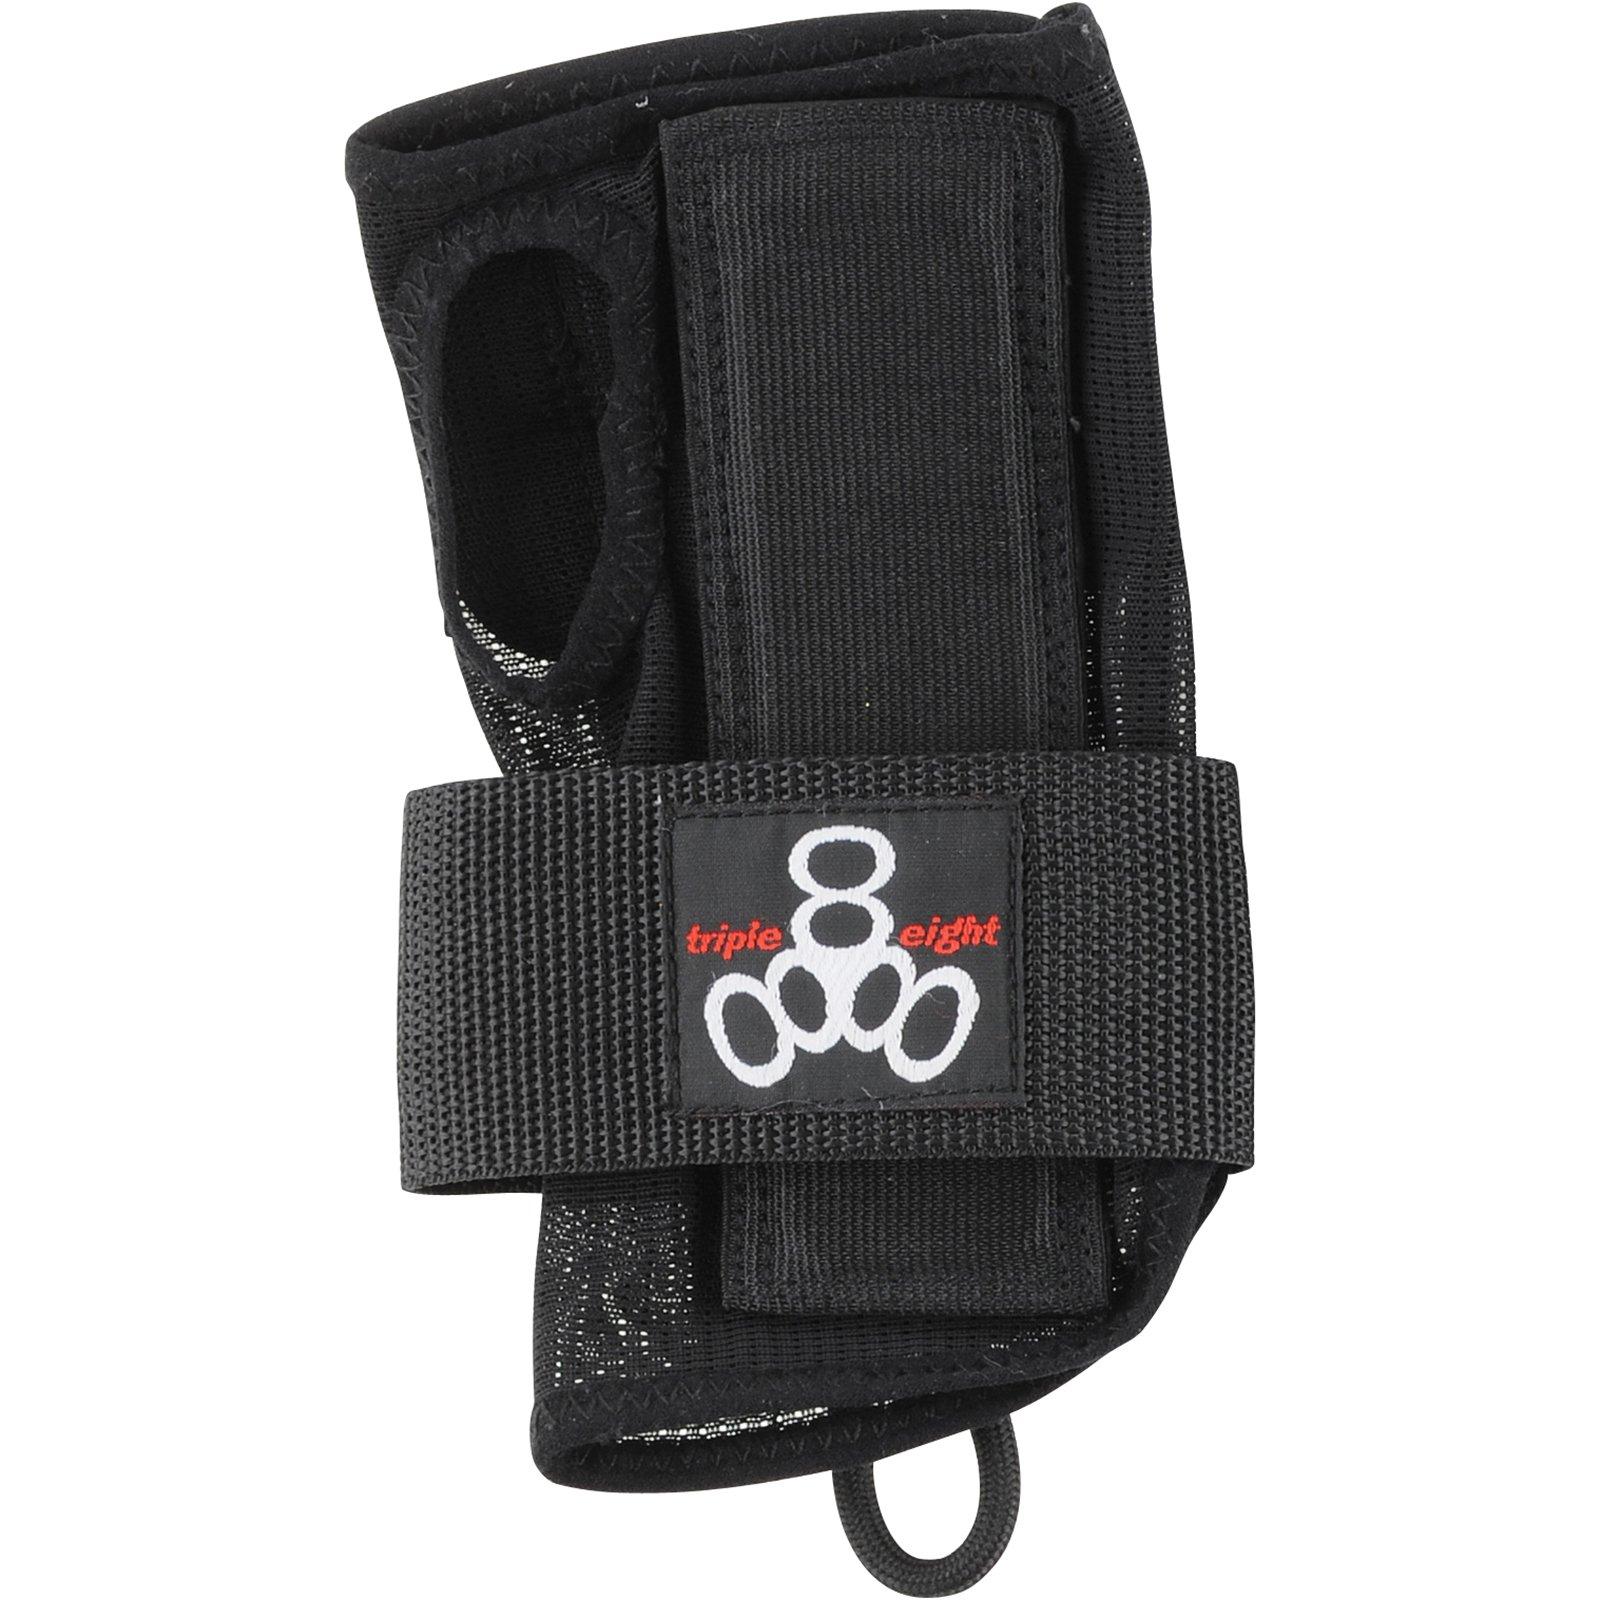 Triple 8 Wristsaver Slide-On Black Junior Wrist Guards